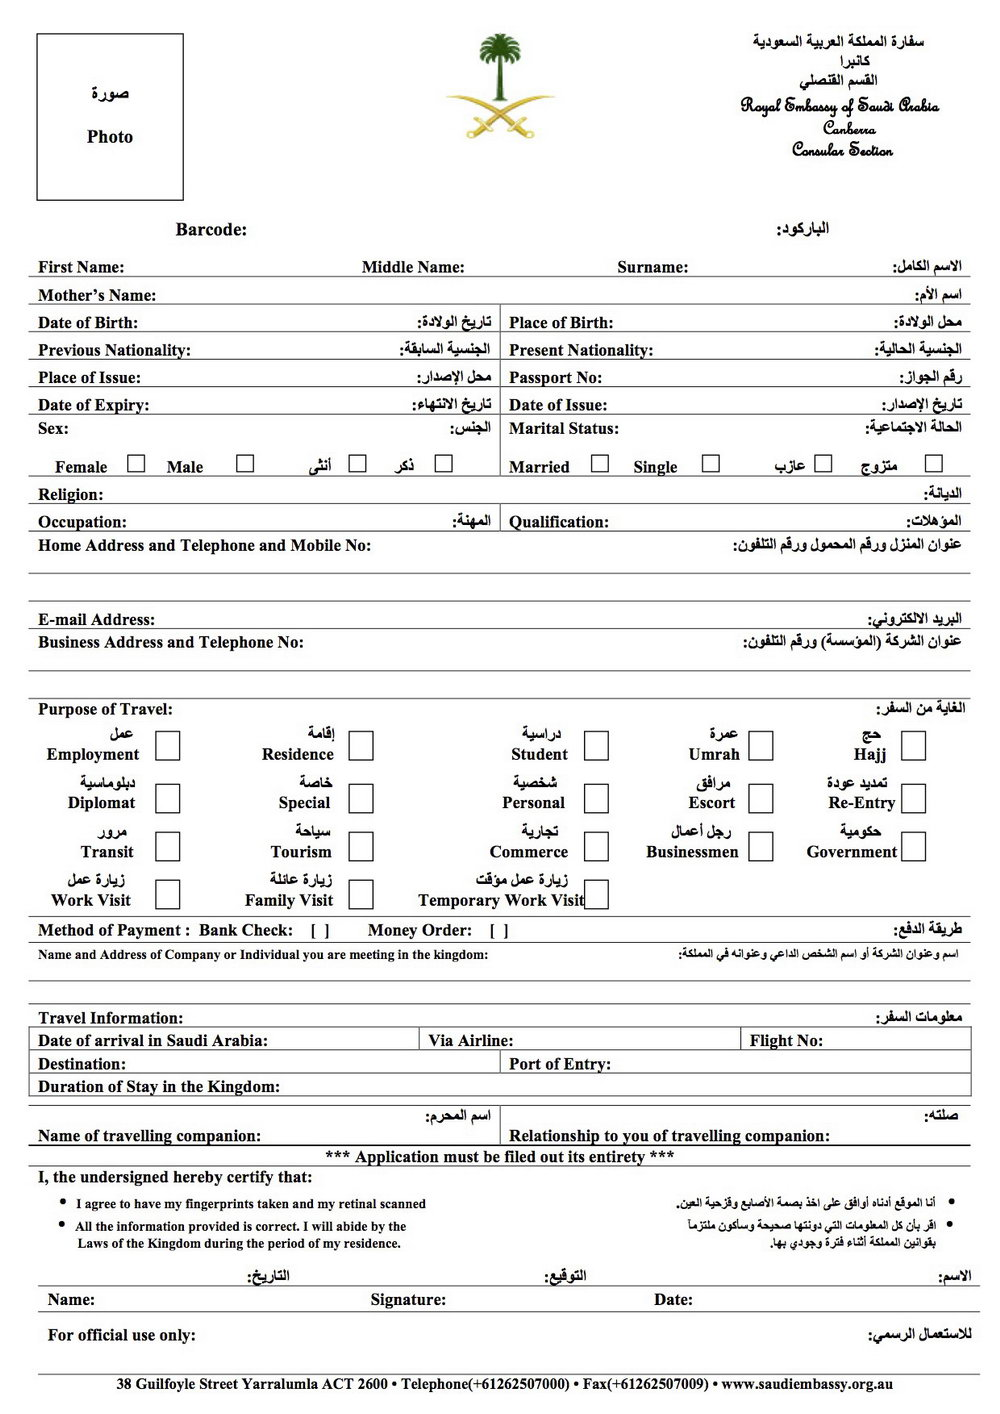 Australian Visa Application Form 1419 Pdf